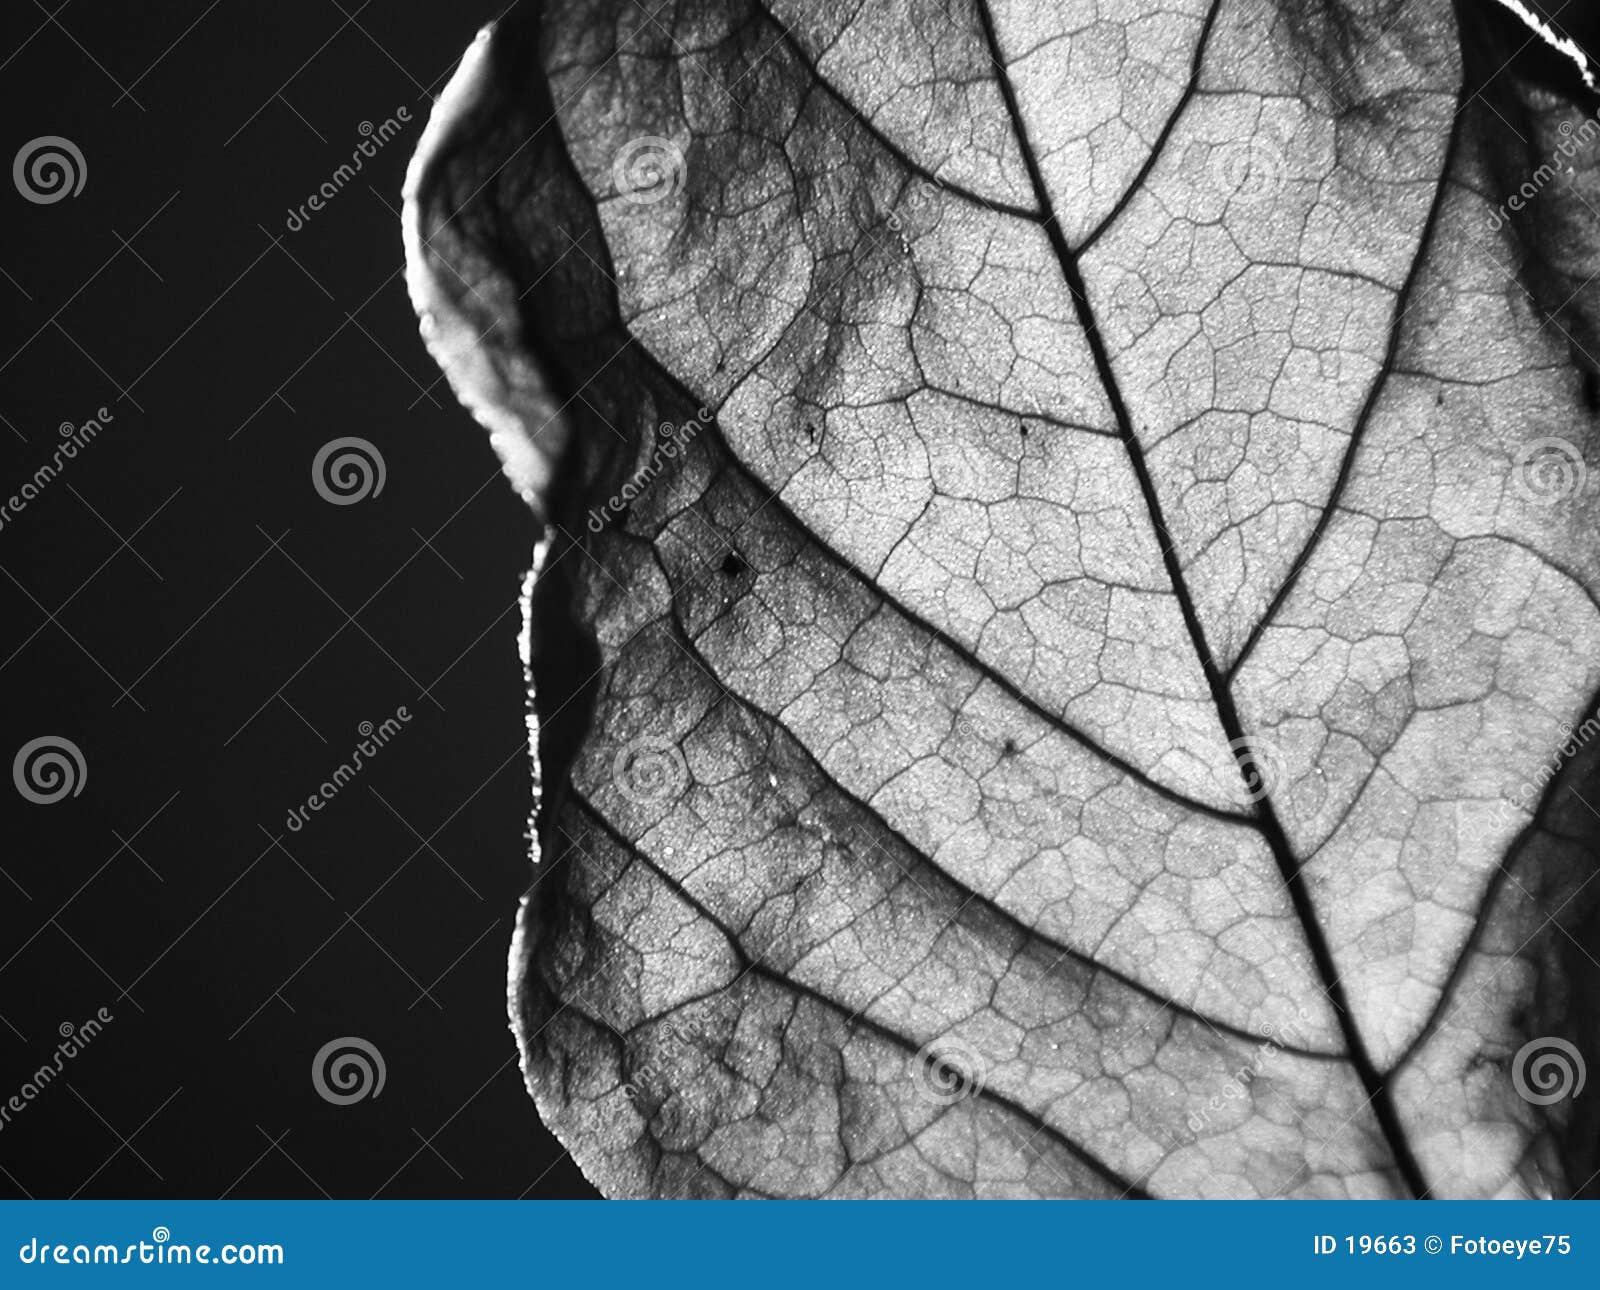 Dried leaf close-up